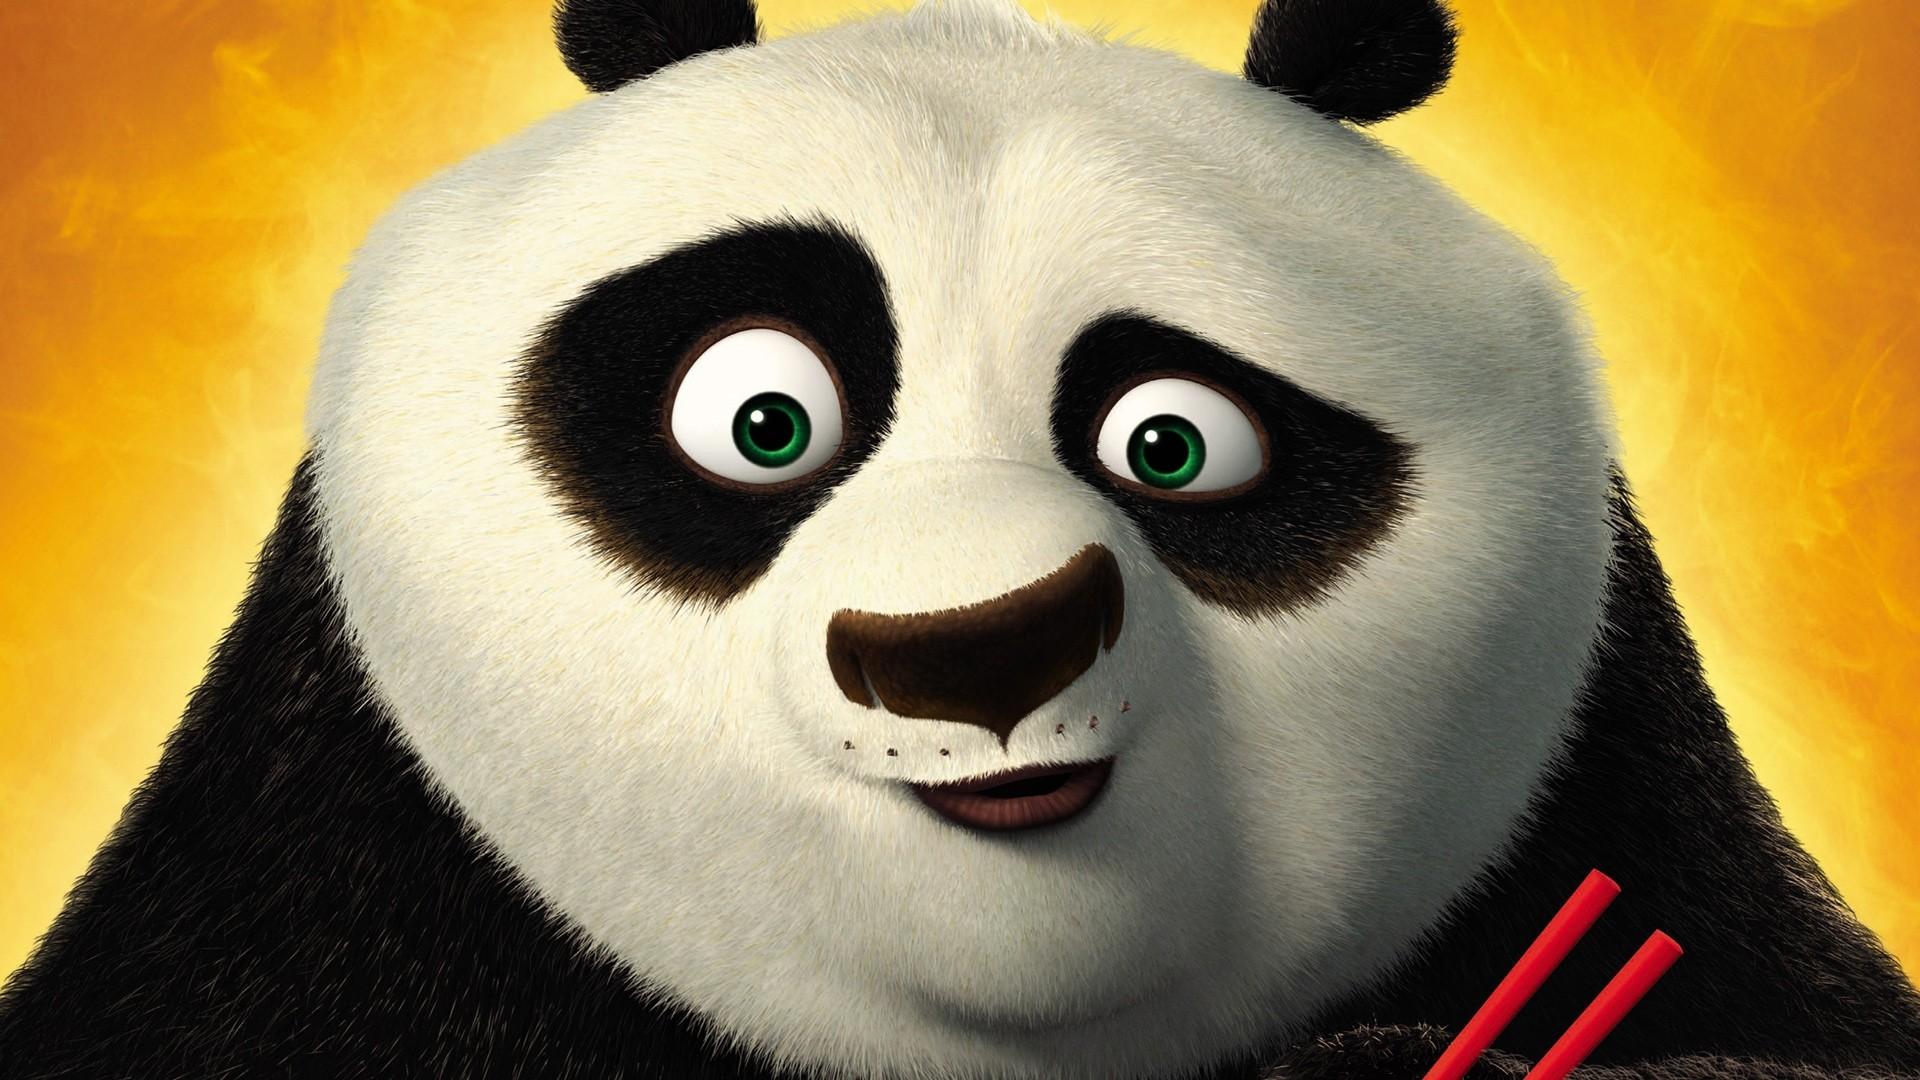 Kung Fu Panda Cool HD Wallpaper